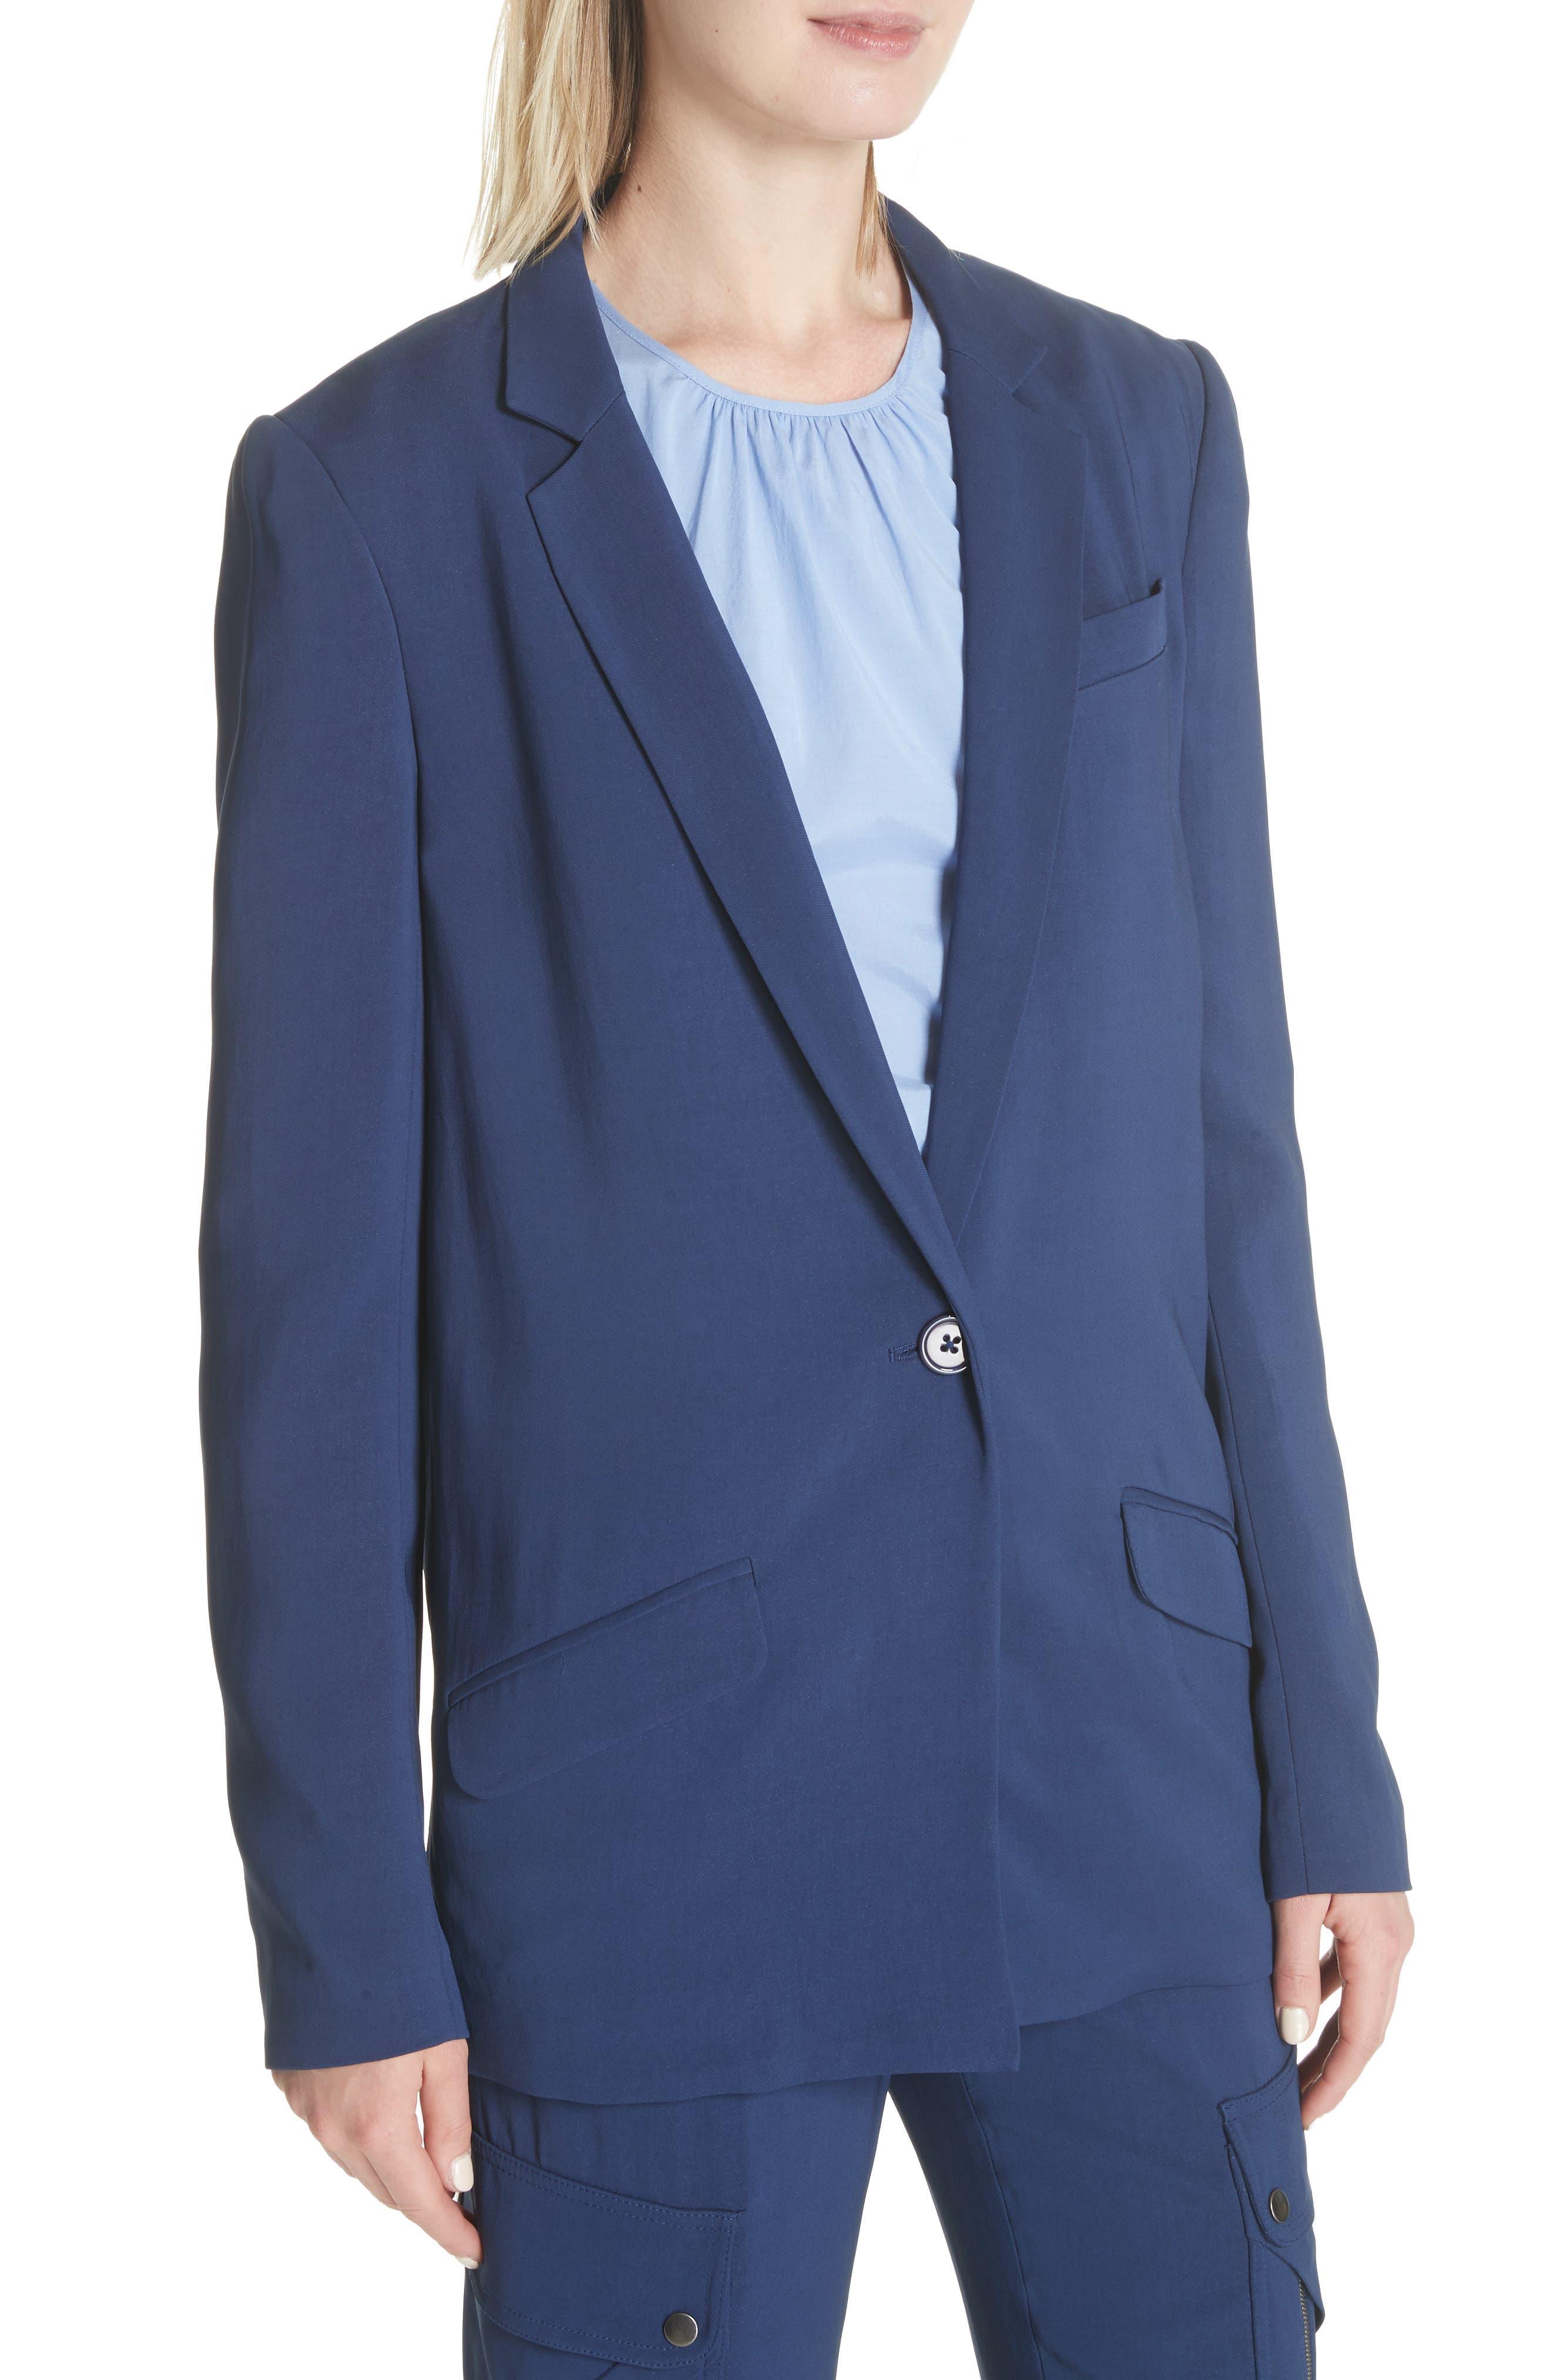 Boxy Suit Jacket,                             Alternate thumbnail 4, color,                             India Ink